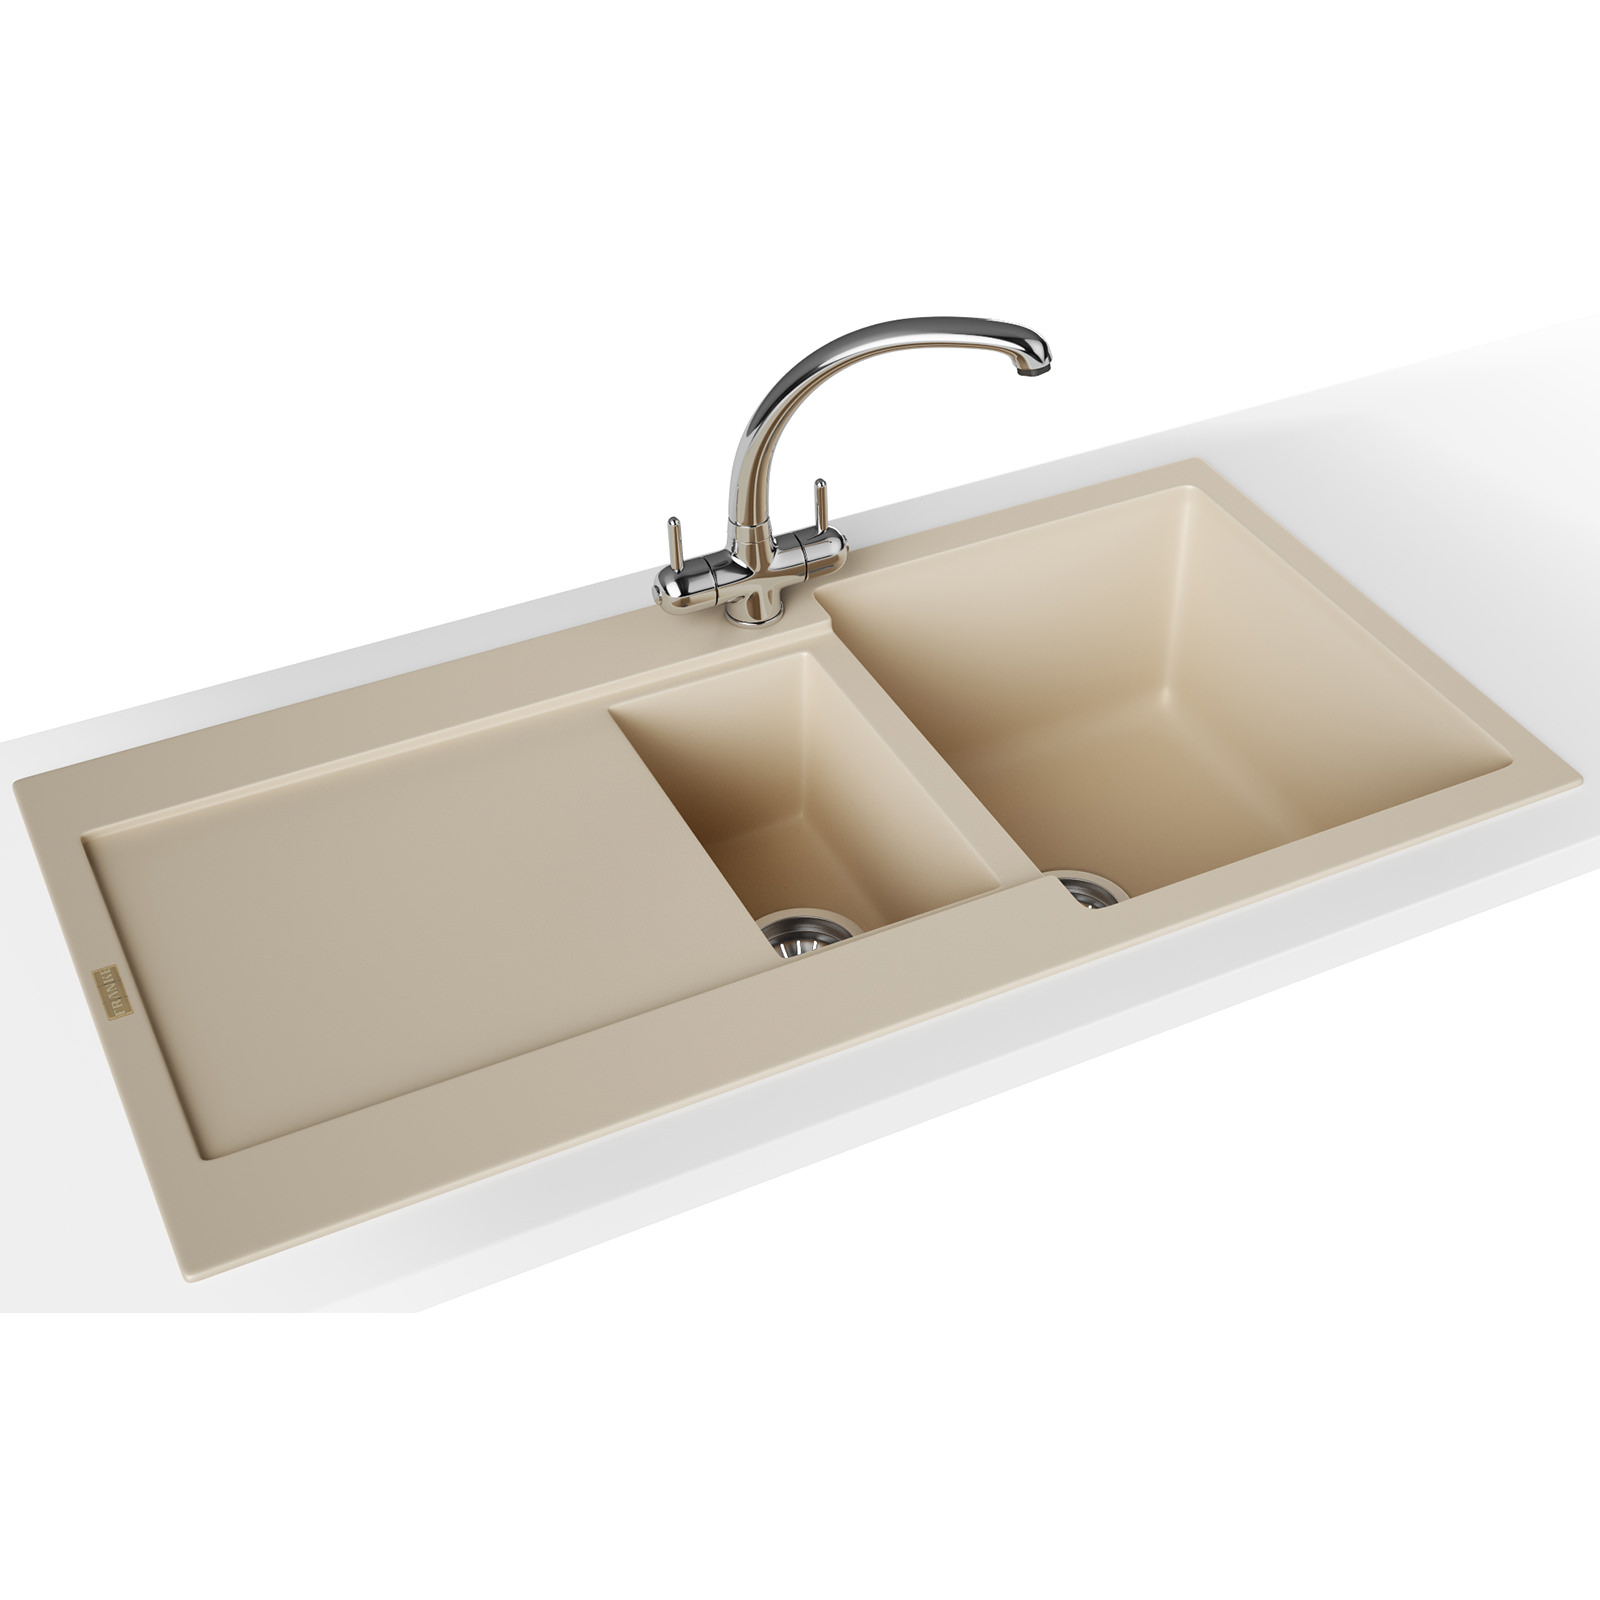 Franke Fragranite Sink Review : Franke Maris Propack MRG 651 Fragranite Coffee Sink And Tap 114.0067 ...